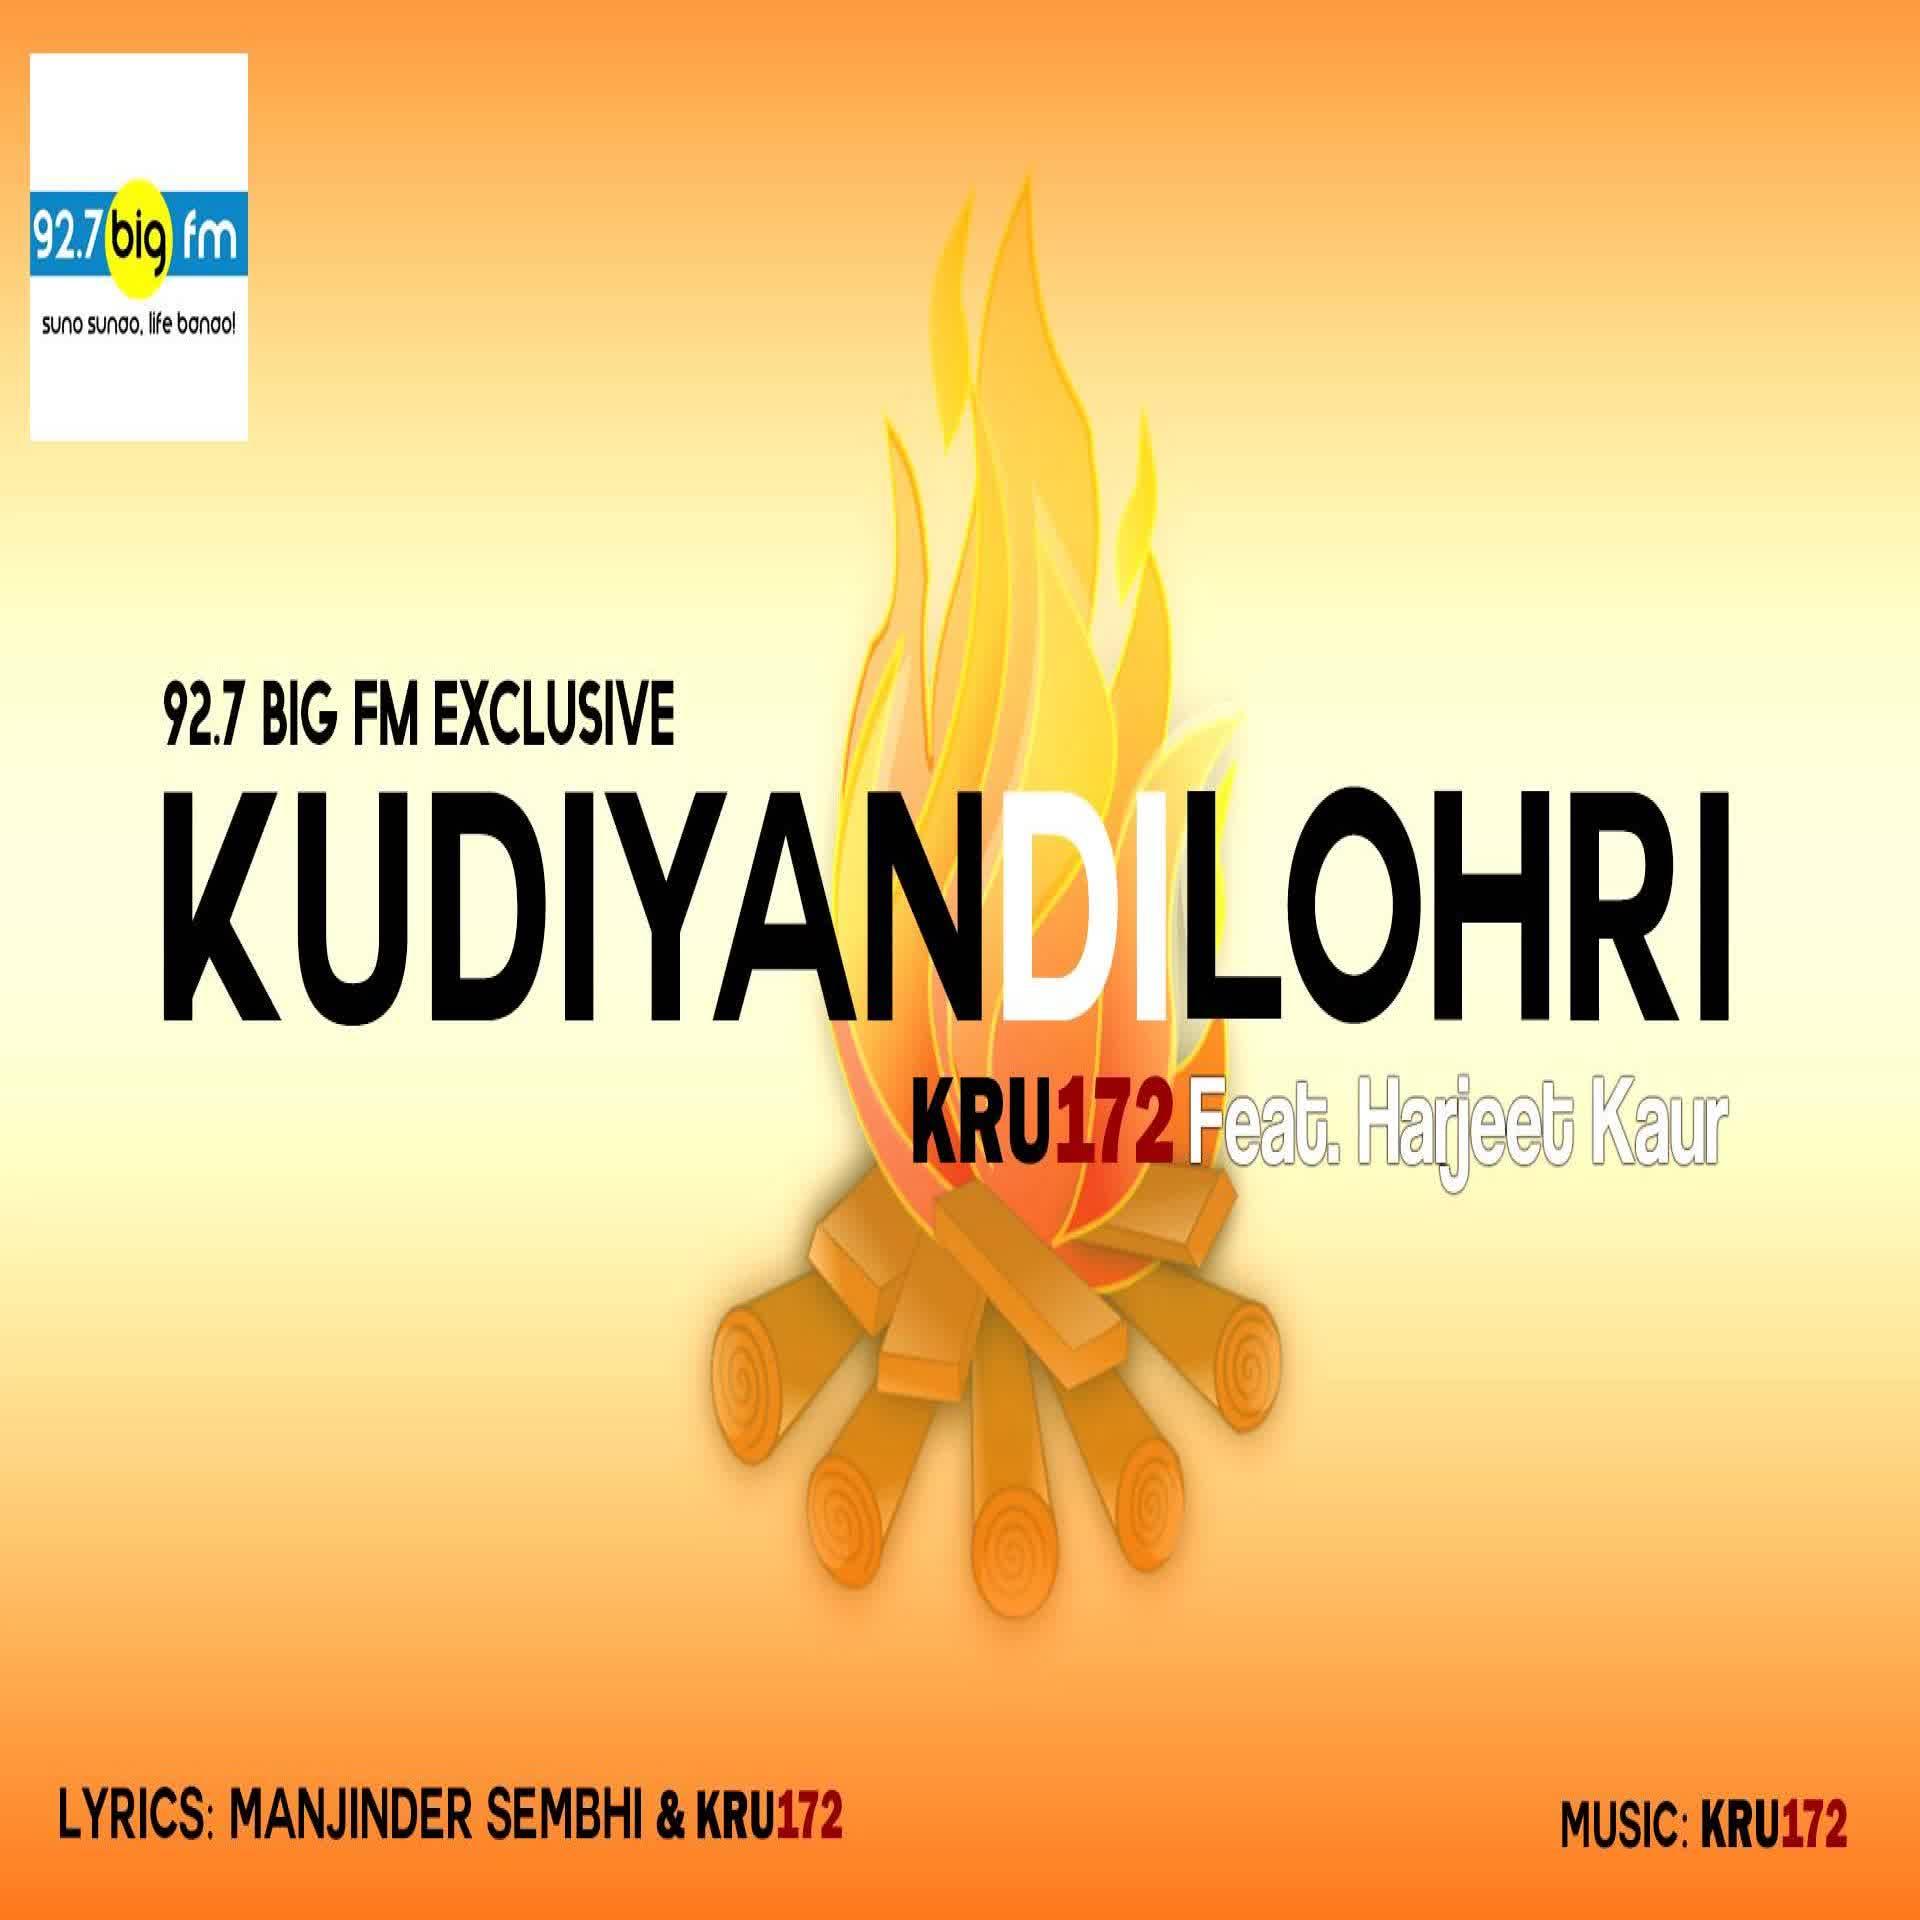 Kudiyan Di Lohri Harjeet Kaur Mp3 Song